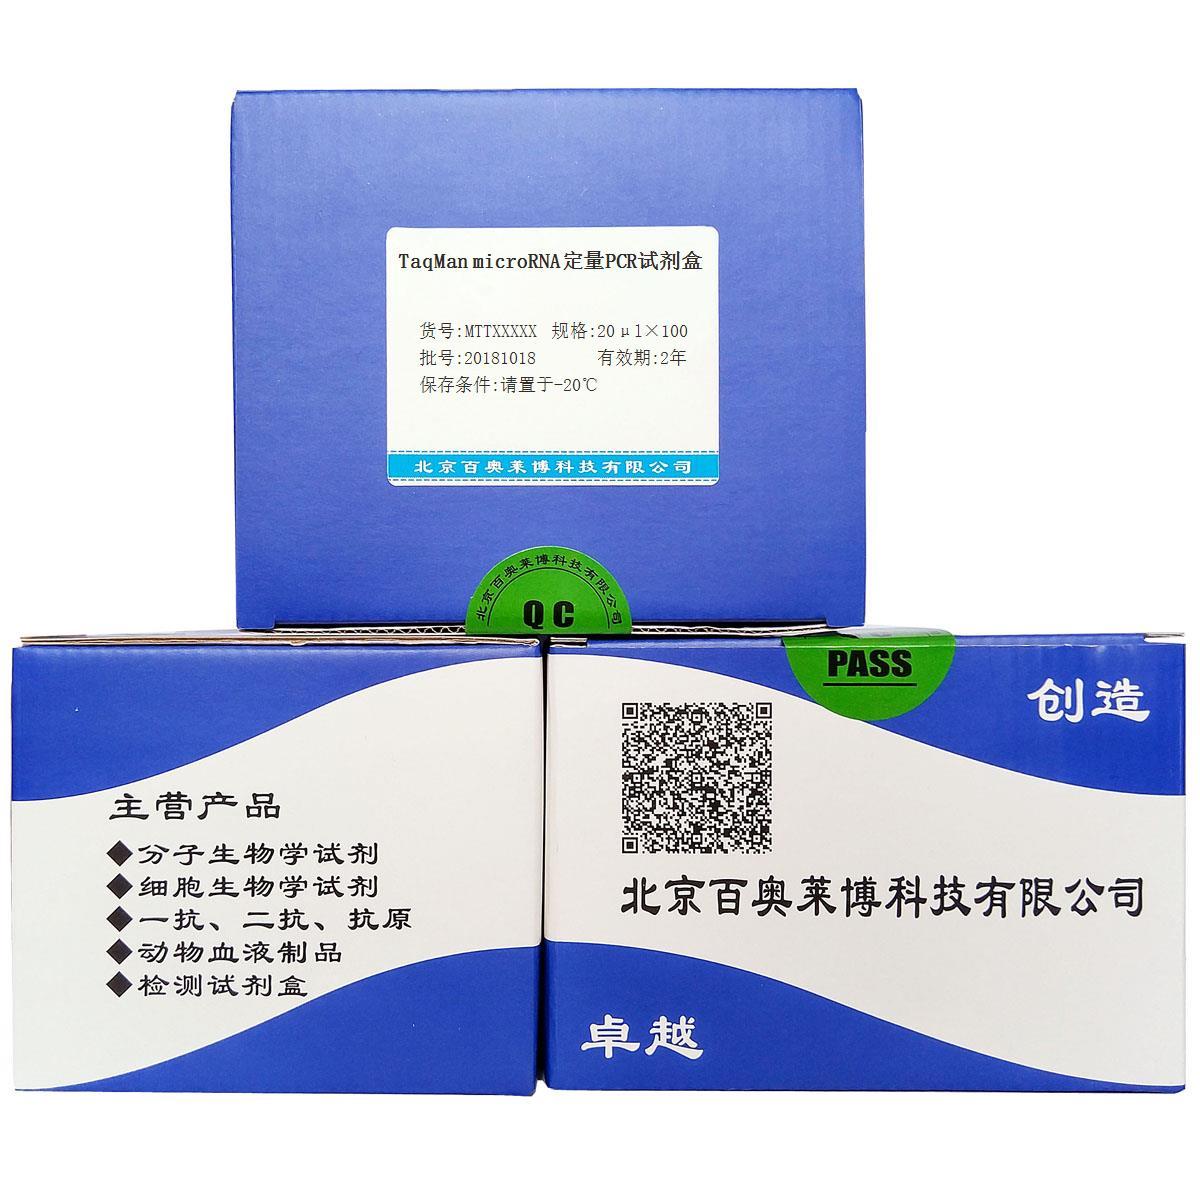 TaqMan microRNA定量PCR试剂盒